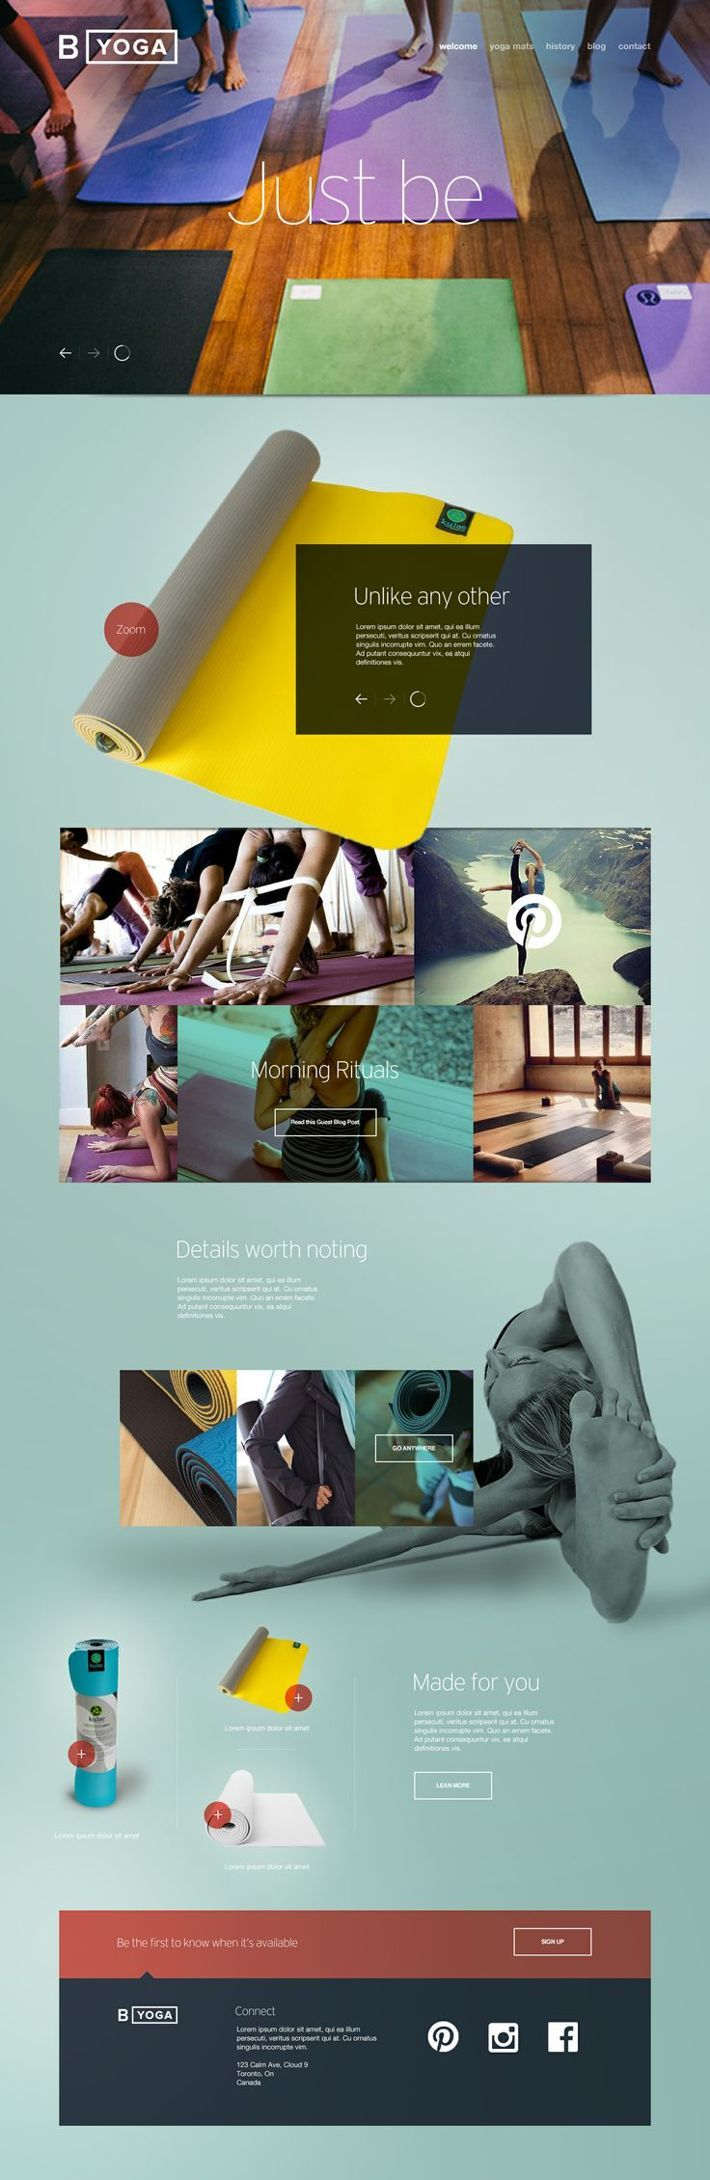 Unique Web Design on the Internet, B Yoga #webdesign #websitedesign #website #design http://www.pinterest.com/aldenchong/